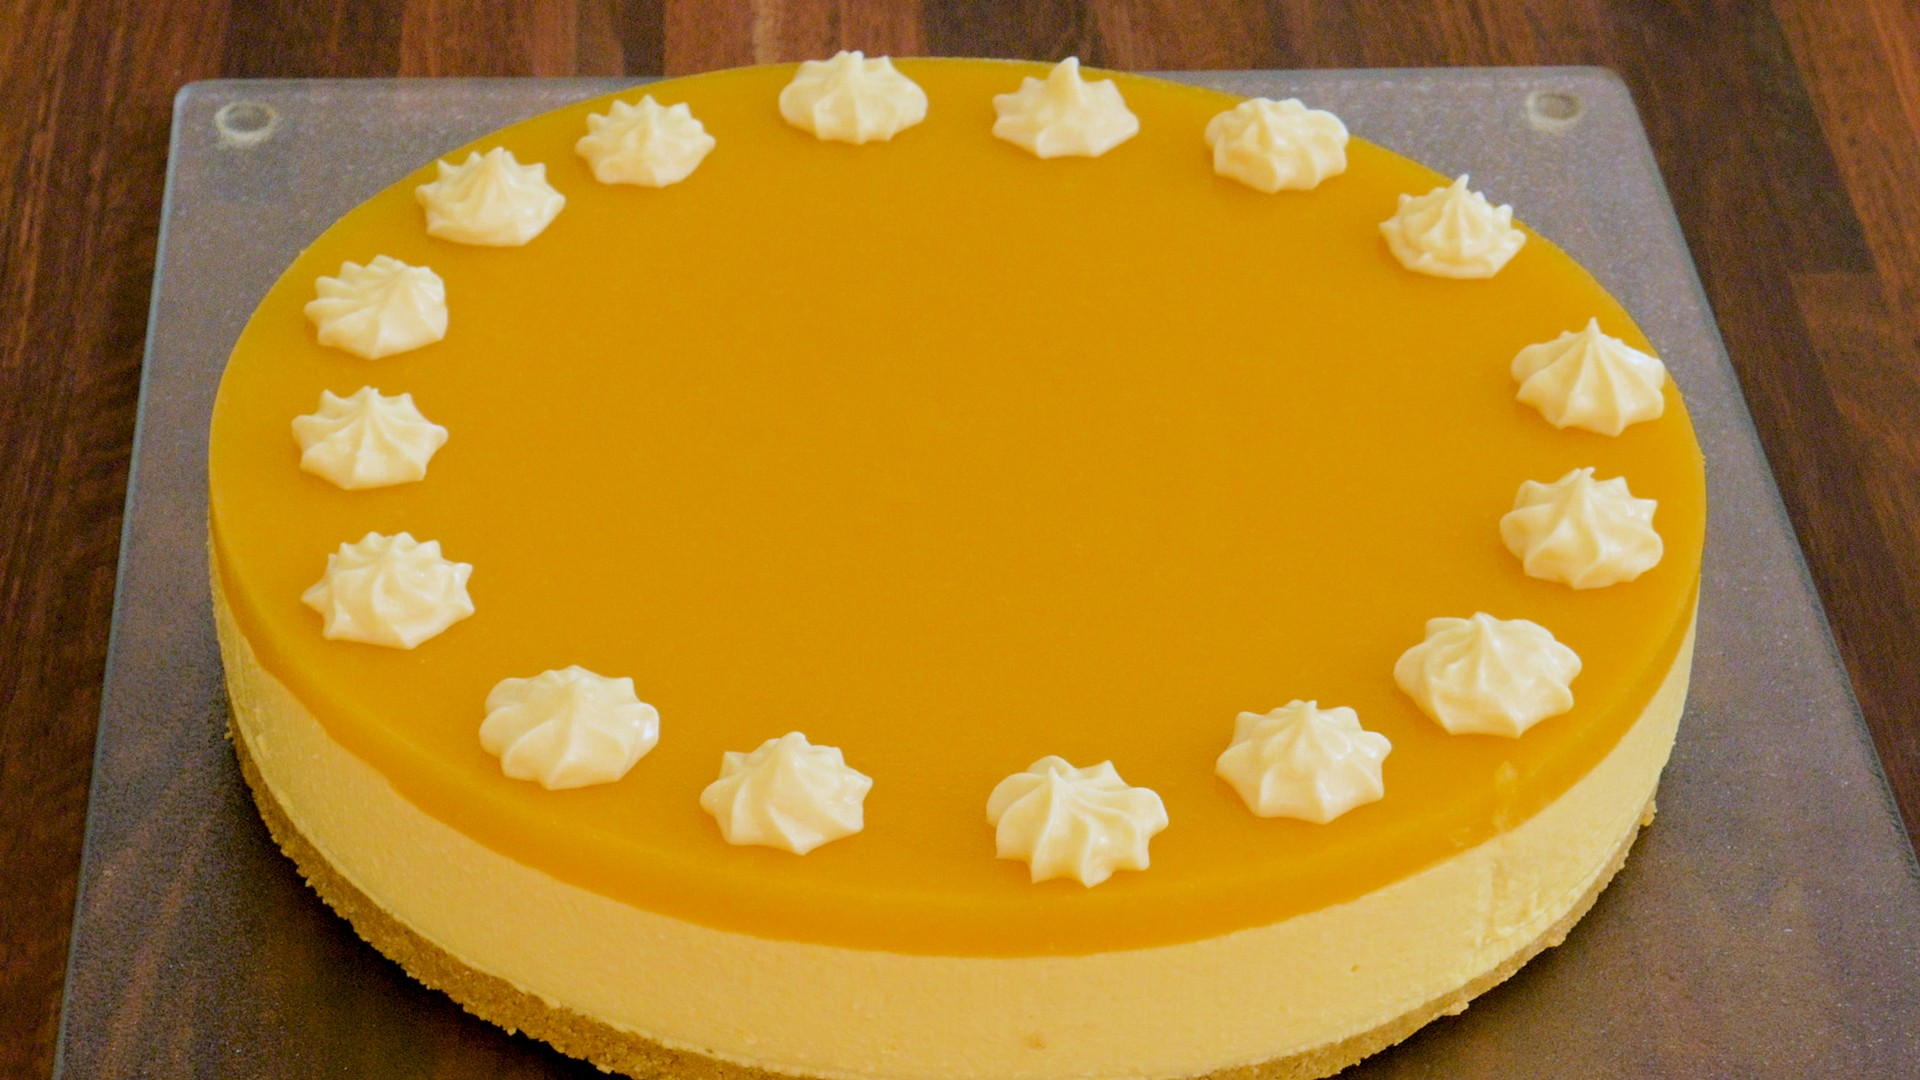 No-Bake Mango Cheesecake Pic 8